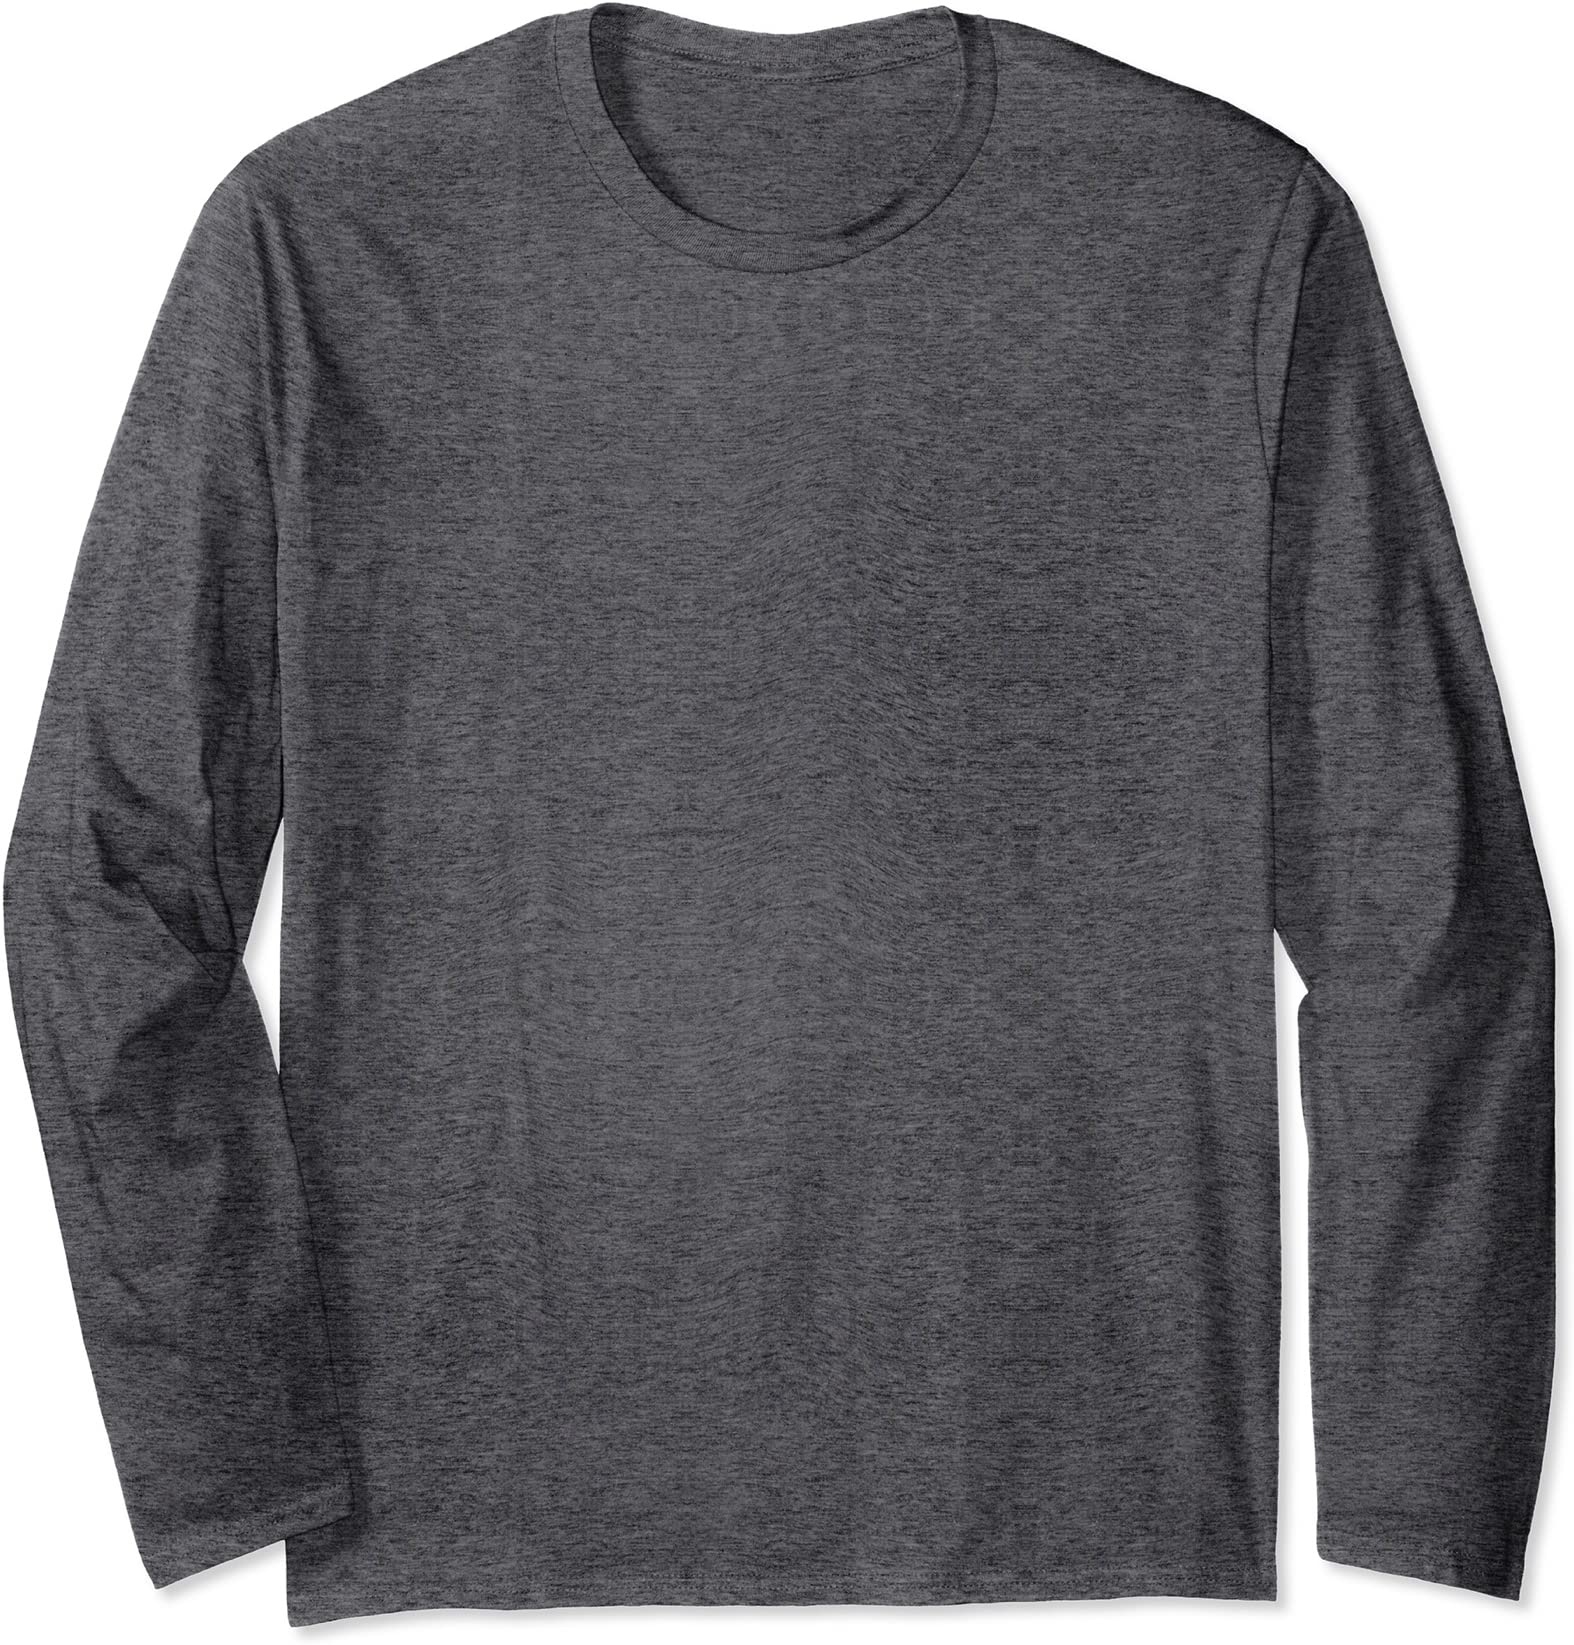 University of North Carolina Greensboro UNCG NCAA College Cotton T-Shirt S-2XL